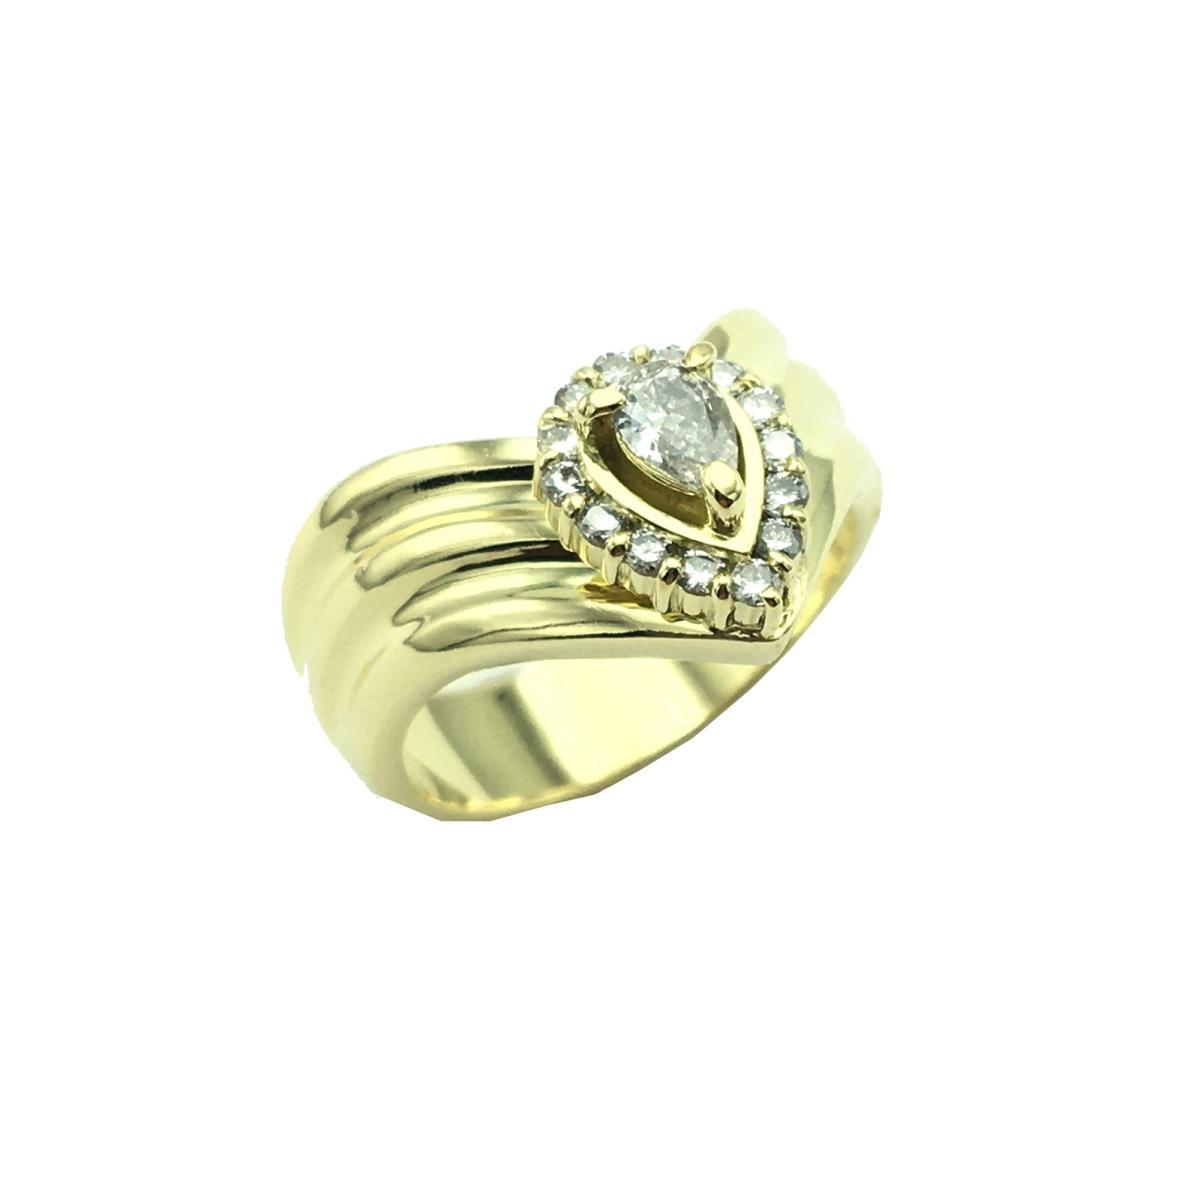 JEWELRY(ジュエリー)/ダイヤモンドリング 指輪 リング/リング/イエローゴールド/K18YG(750)×D 0.15ct×0.18ct/【ランクA】/10号【中古】